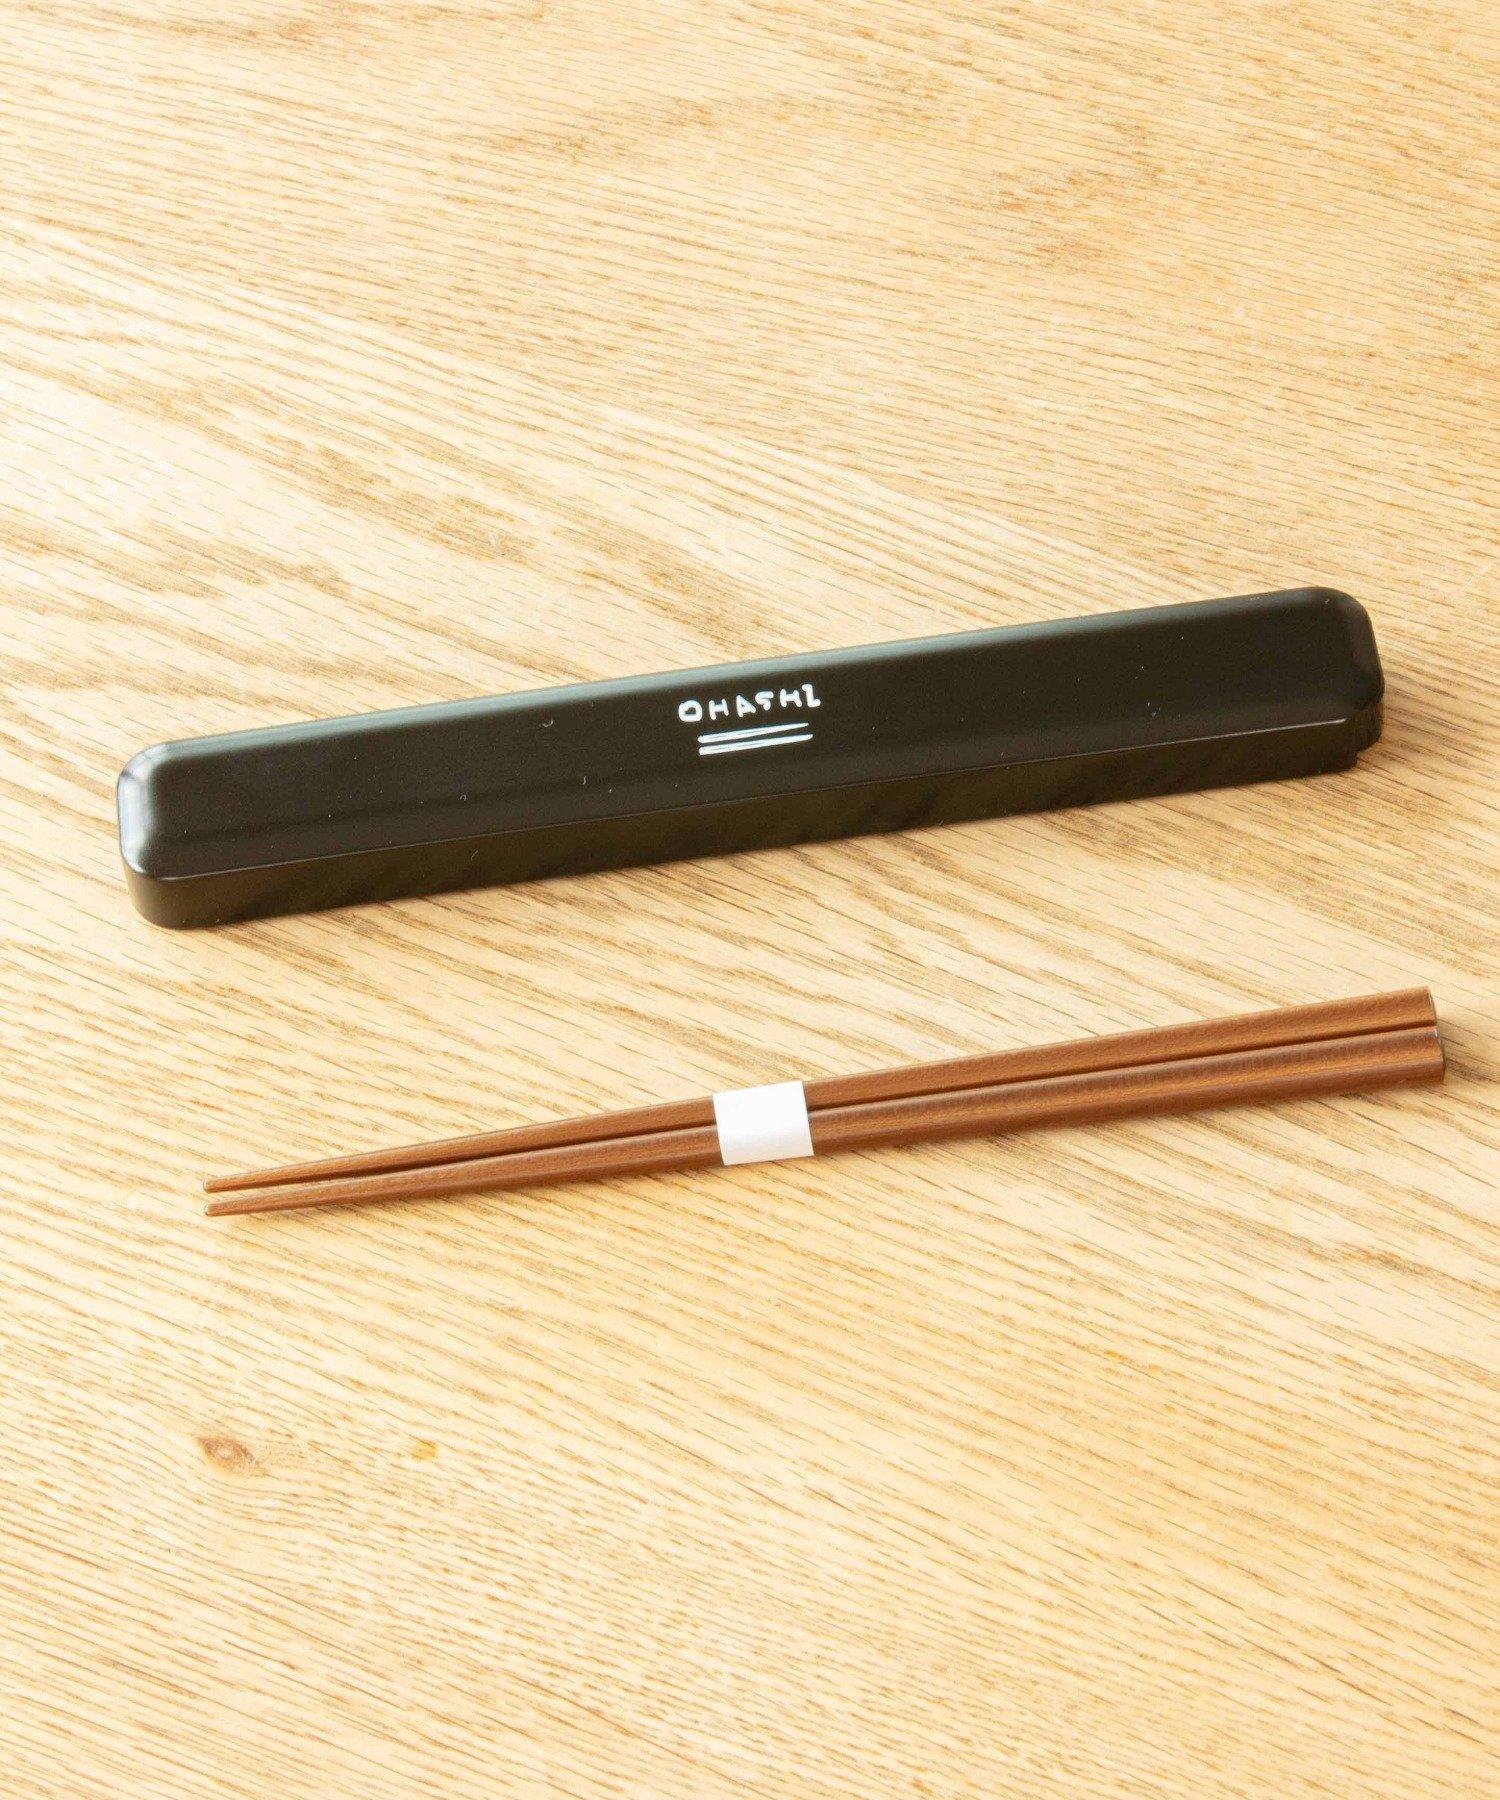 CIAOPANIC TYPY(チャオパニックティピー) ライフスタイル 【aamu-アーム】木製 箸 ブラック